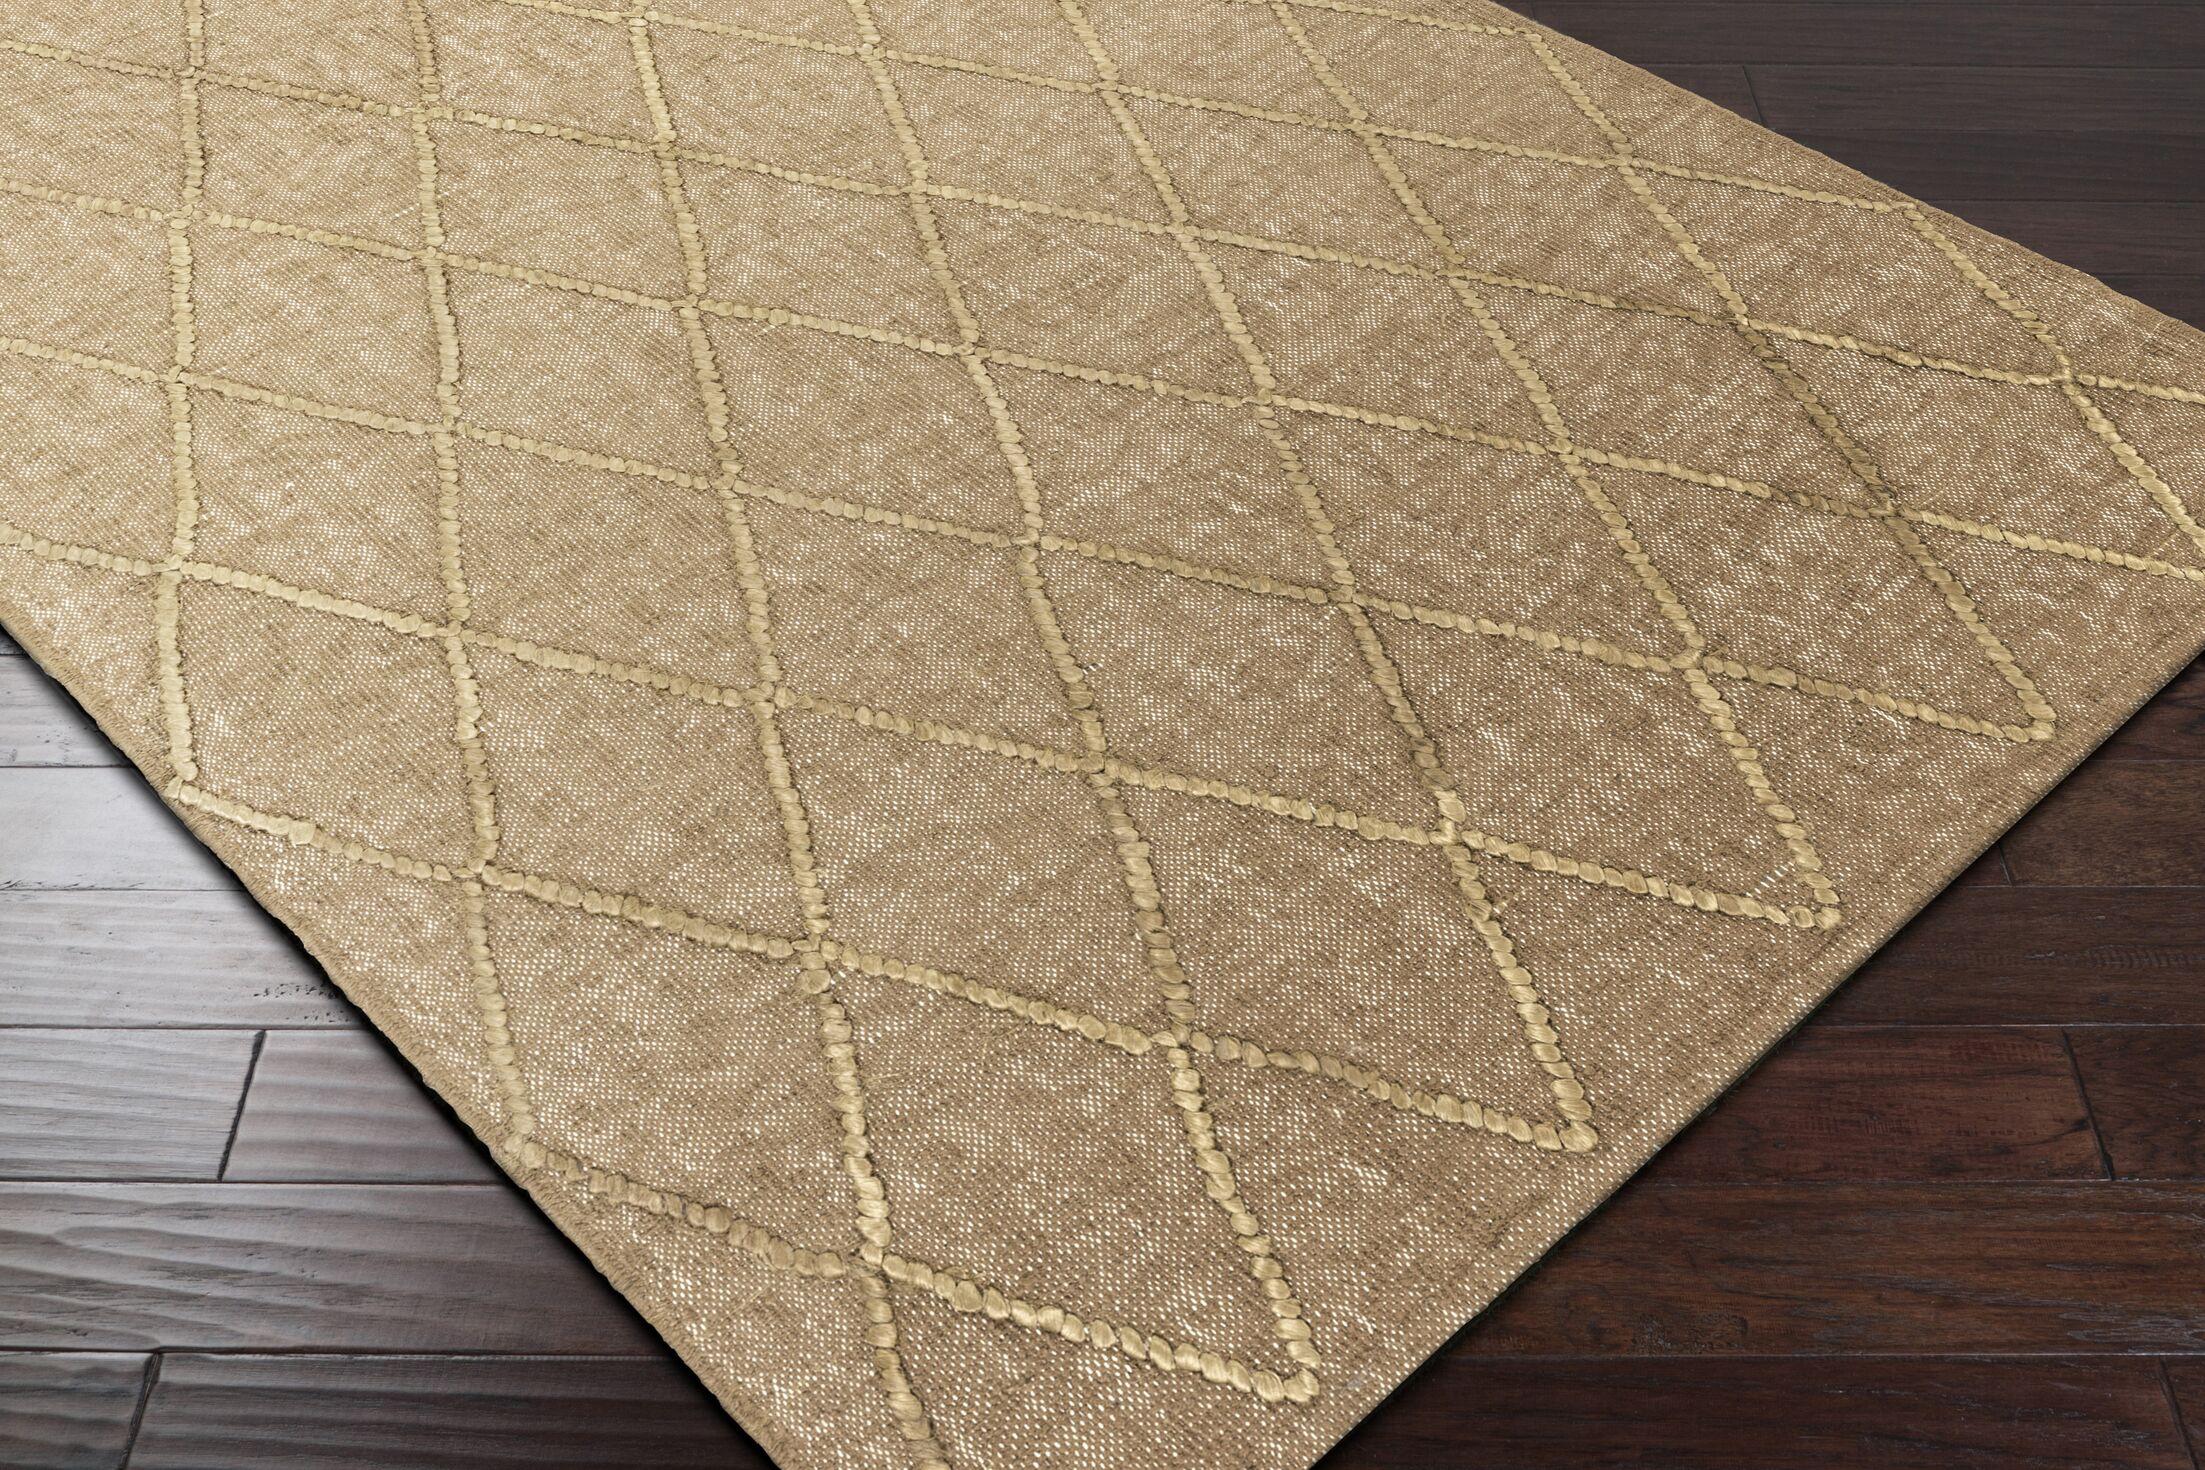 Rachelle Hand-Woven Brown Area Rug Rug Size: Rectangle 9' x 13'